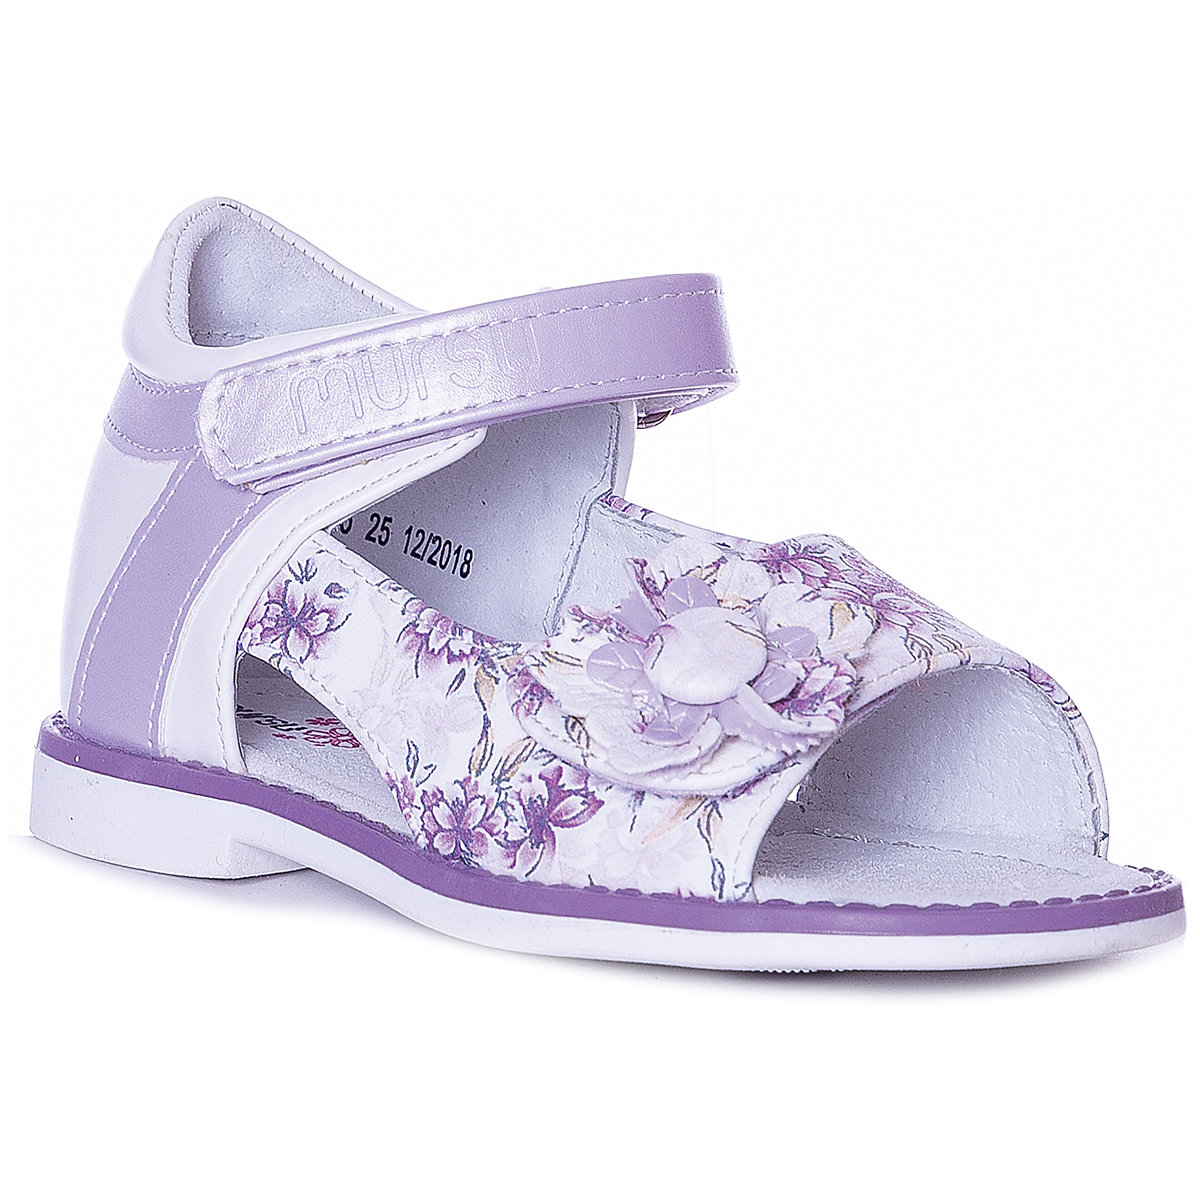 MURSU Sandals 10611993 children\'s shoes comfortable and light girls and boys MTpromo kakadu sandals 10696136 clogs comfortable and light children s shoes girls and boys